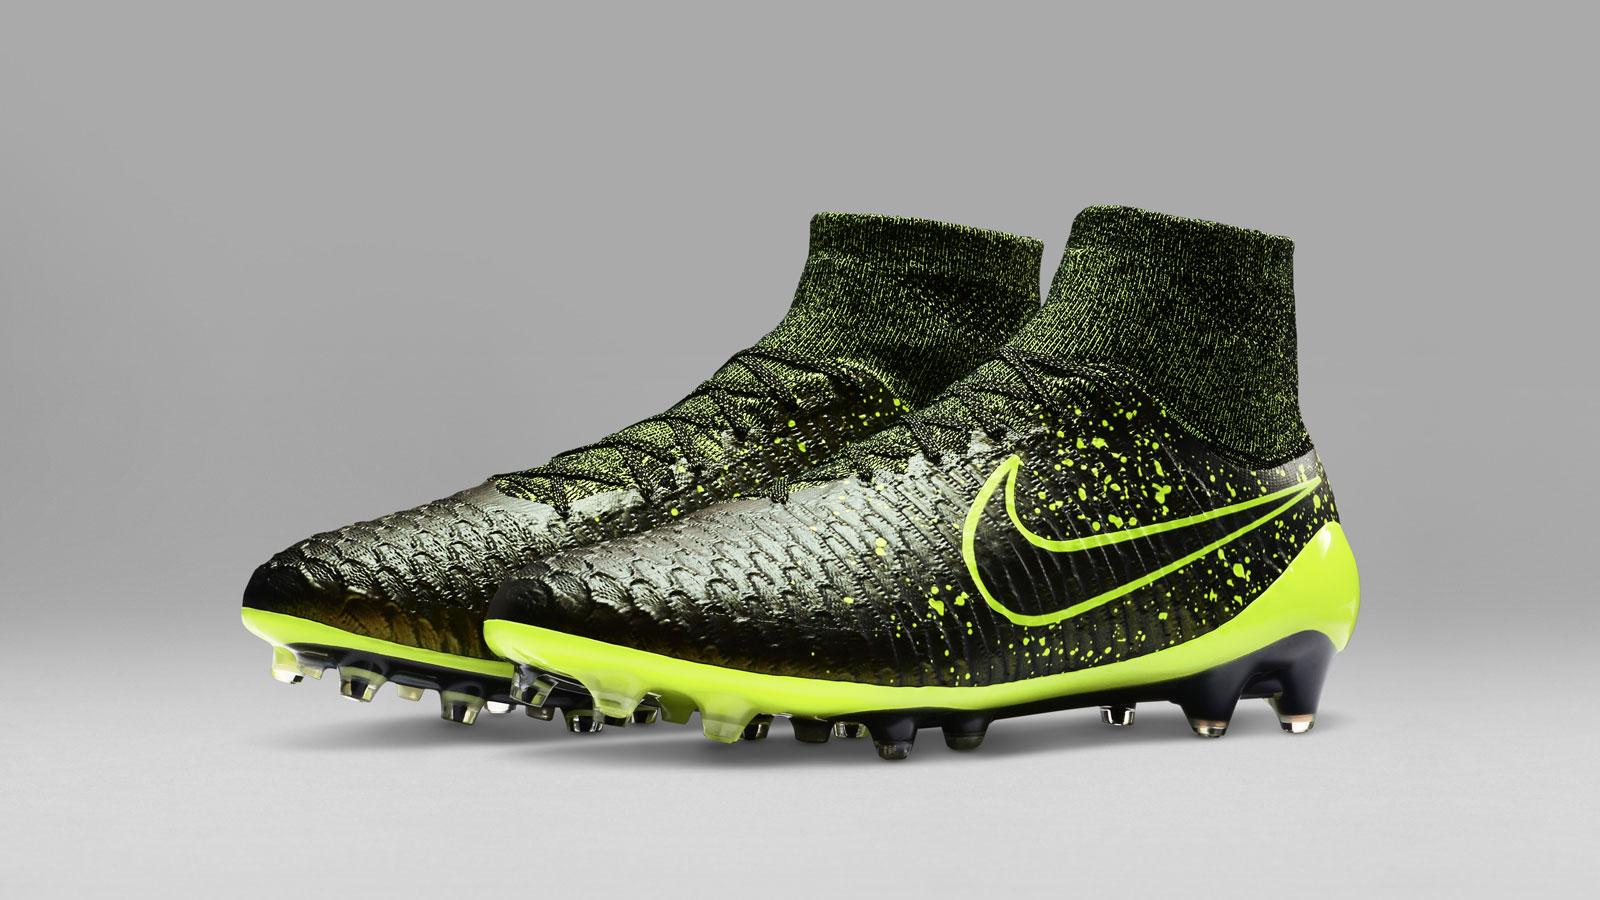 Die Nike Magista Obra Tech Electro Flare Pack Schuhe